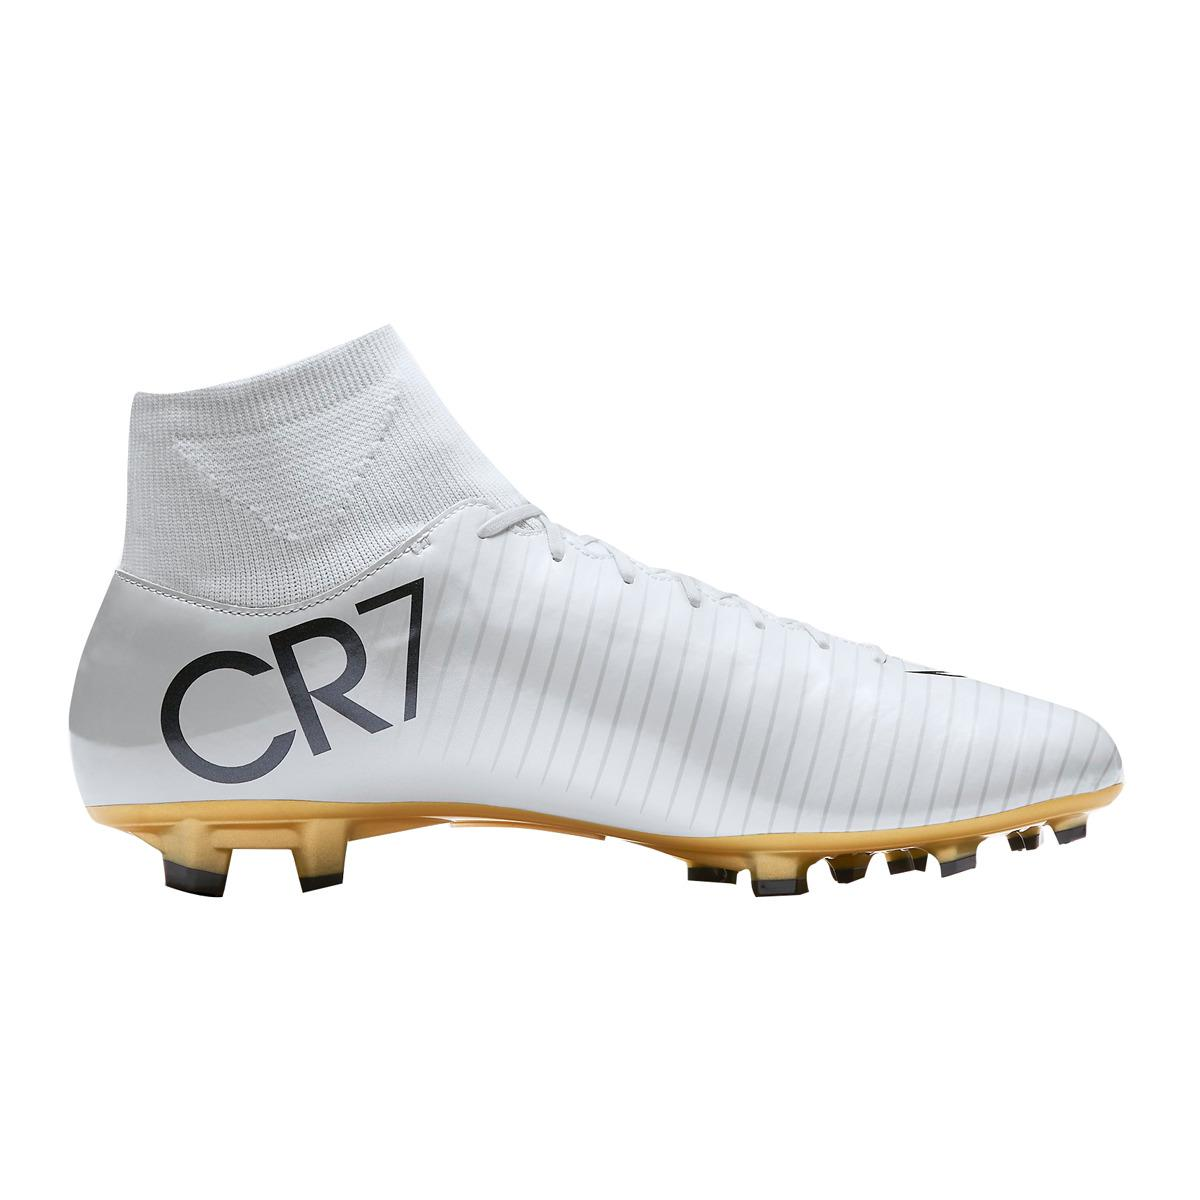 Lyst - Nike Mercurial Victory Vi Dynamic Fit Cr7 Se Football Boots ... 5de92cda6e8